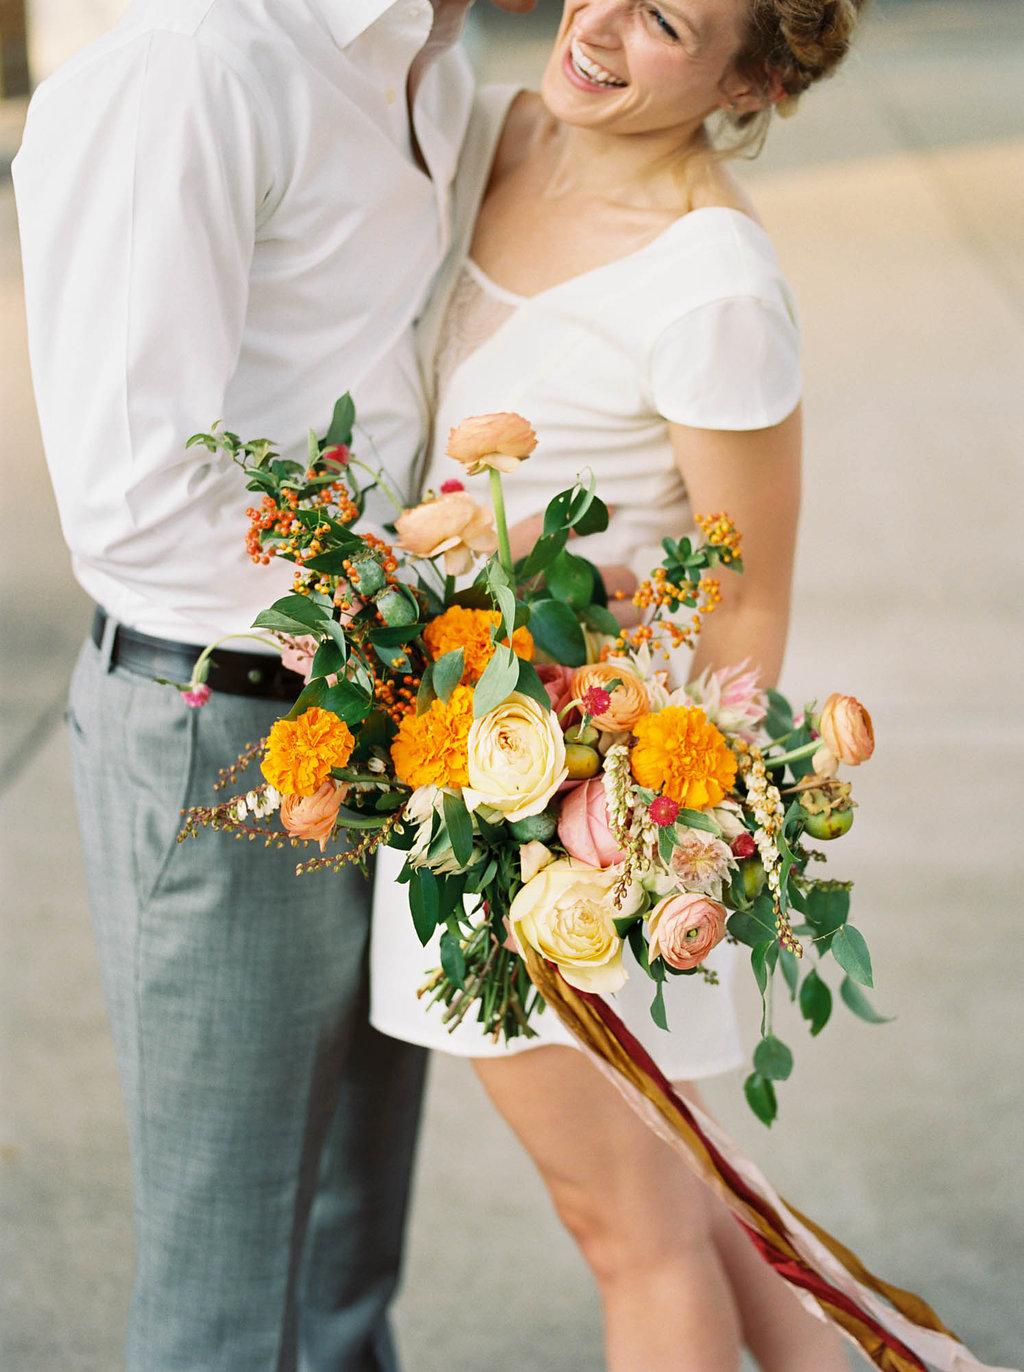 Retro elopement wedding inspiration with cheerful, colorful florals // Nashville Wedding Florist